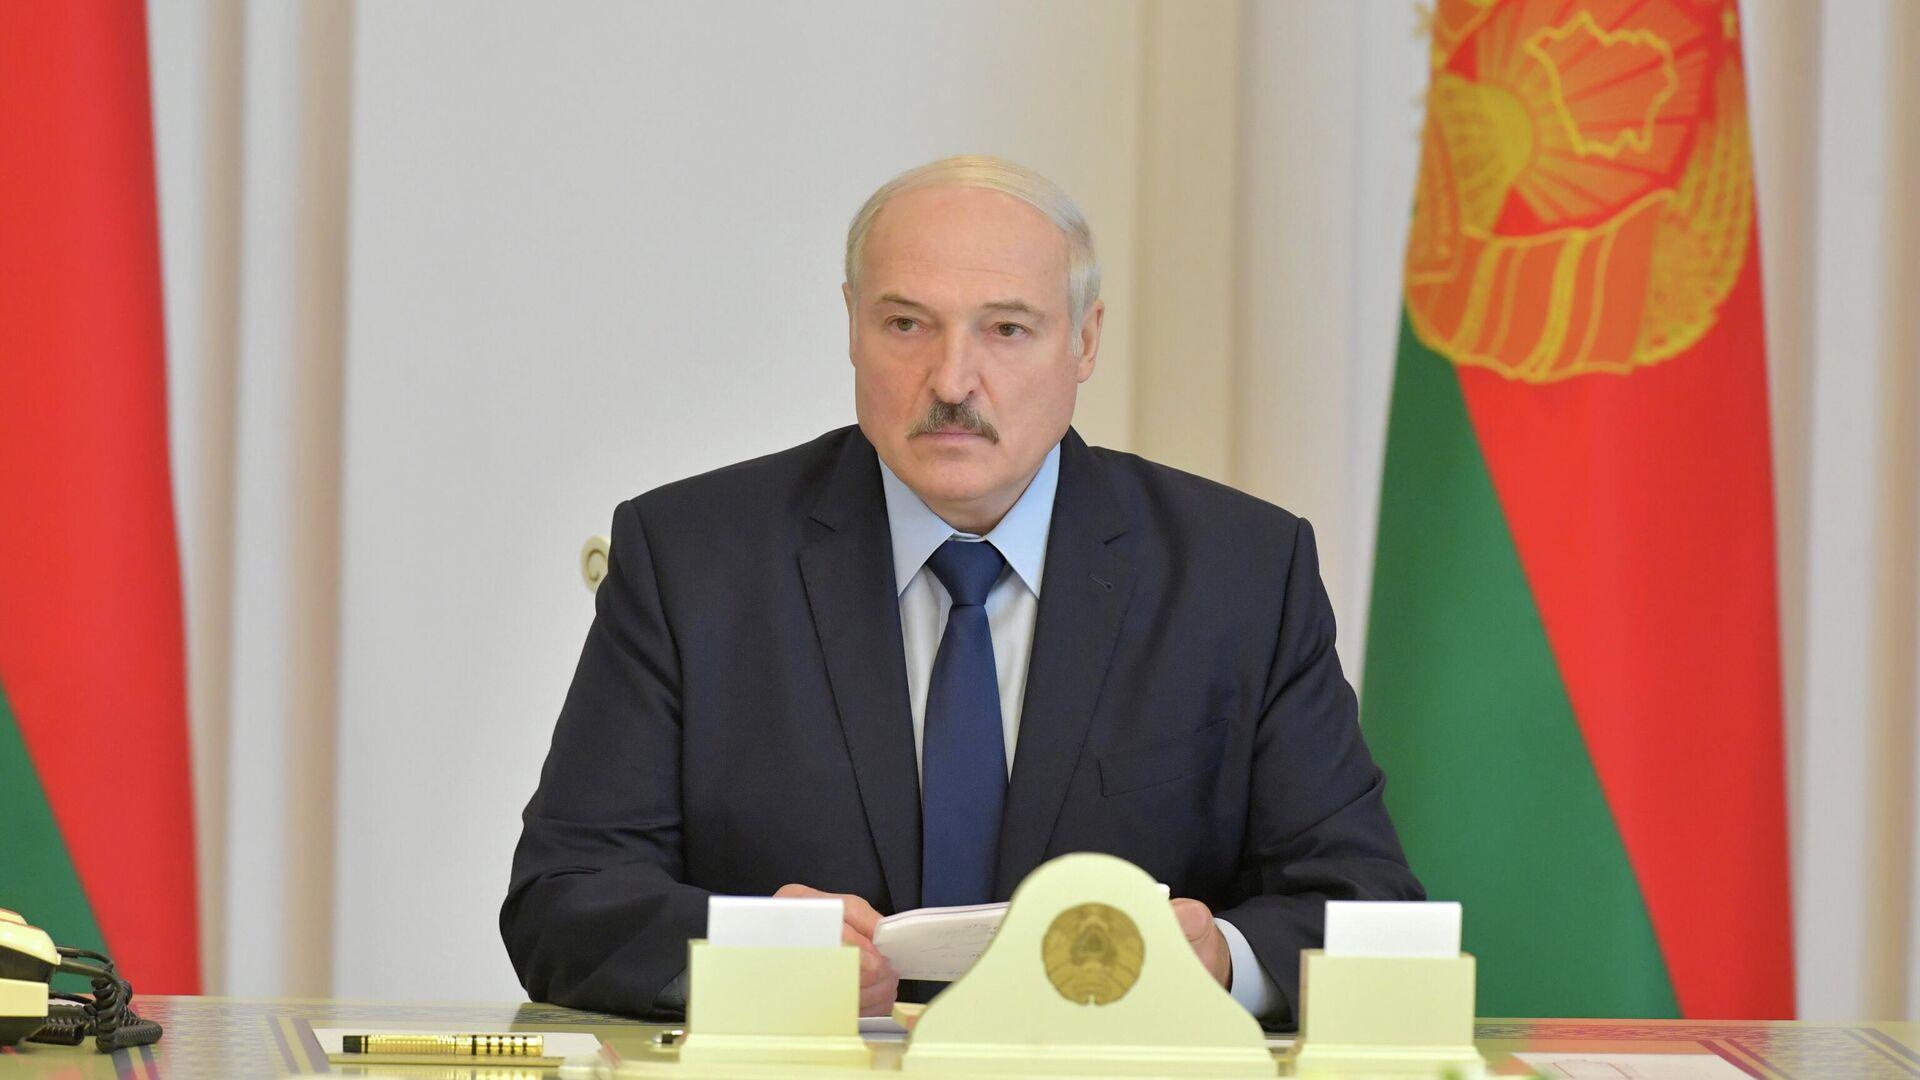 Президент Белоруссии Александр Лукашенко во время совещания в Минске - РИА Новости, 1920, 01.09.2020